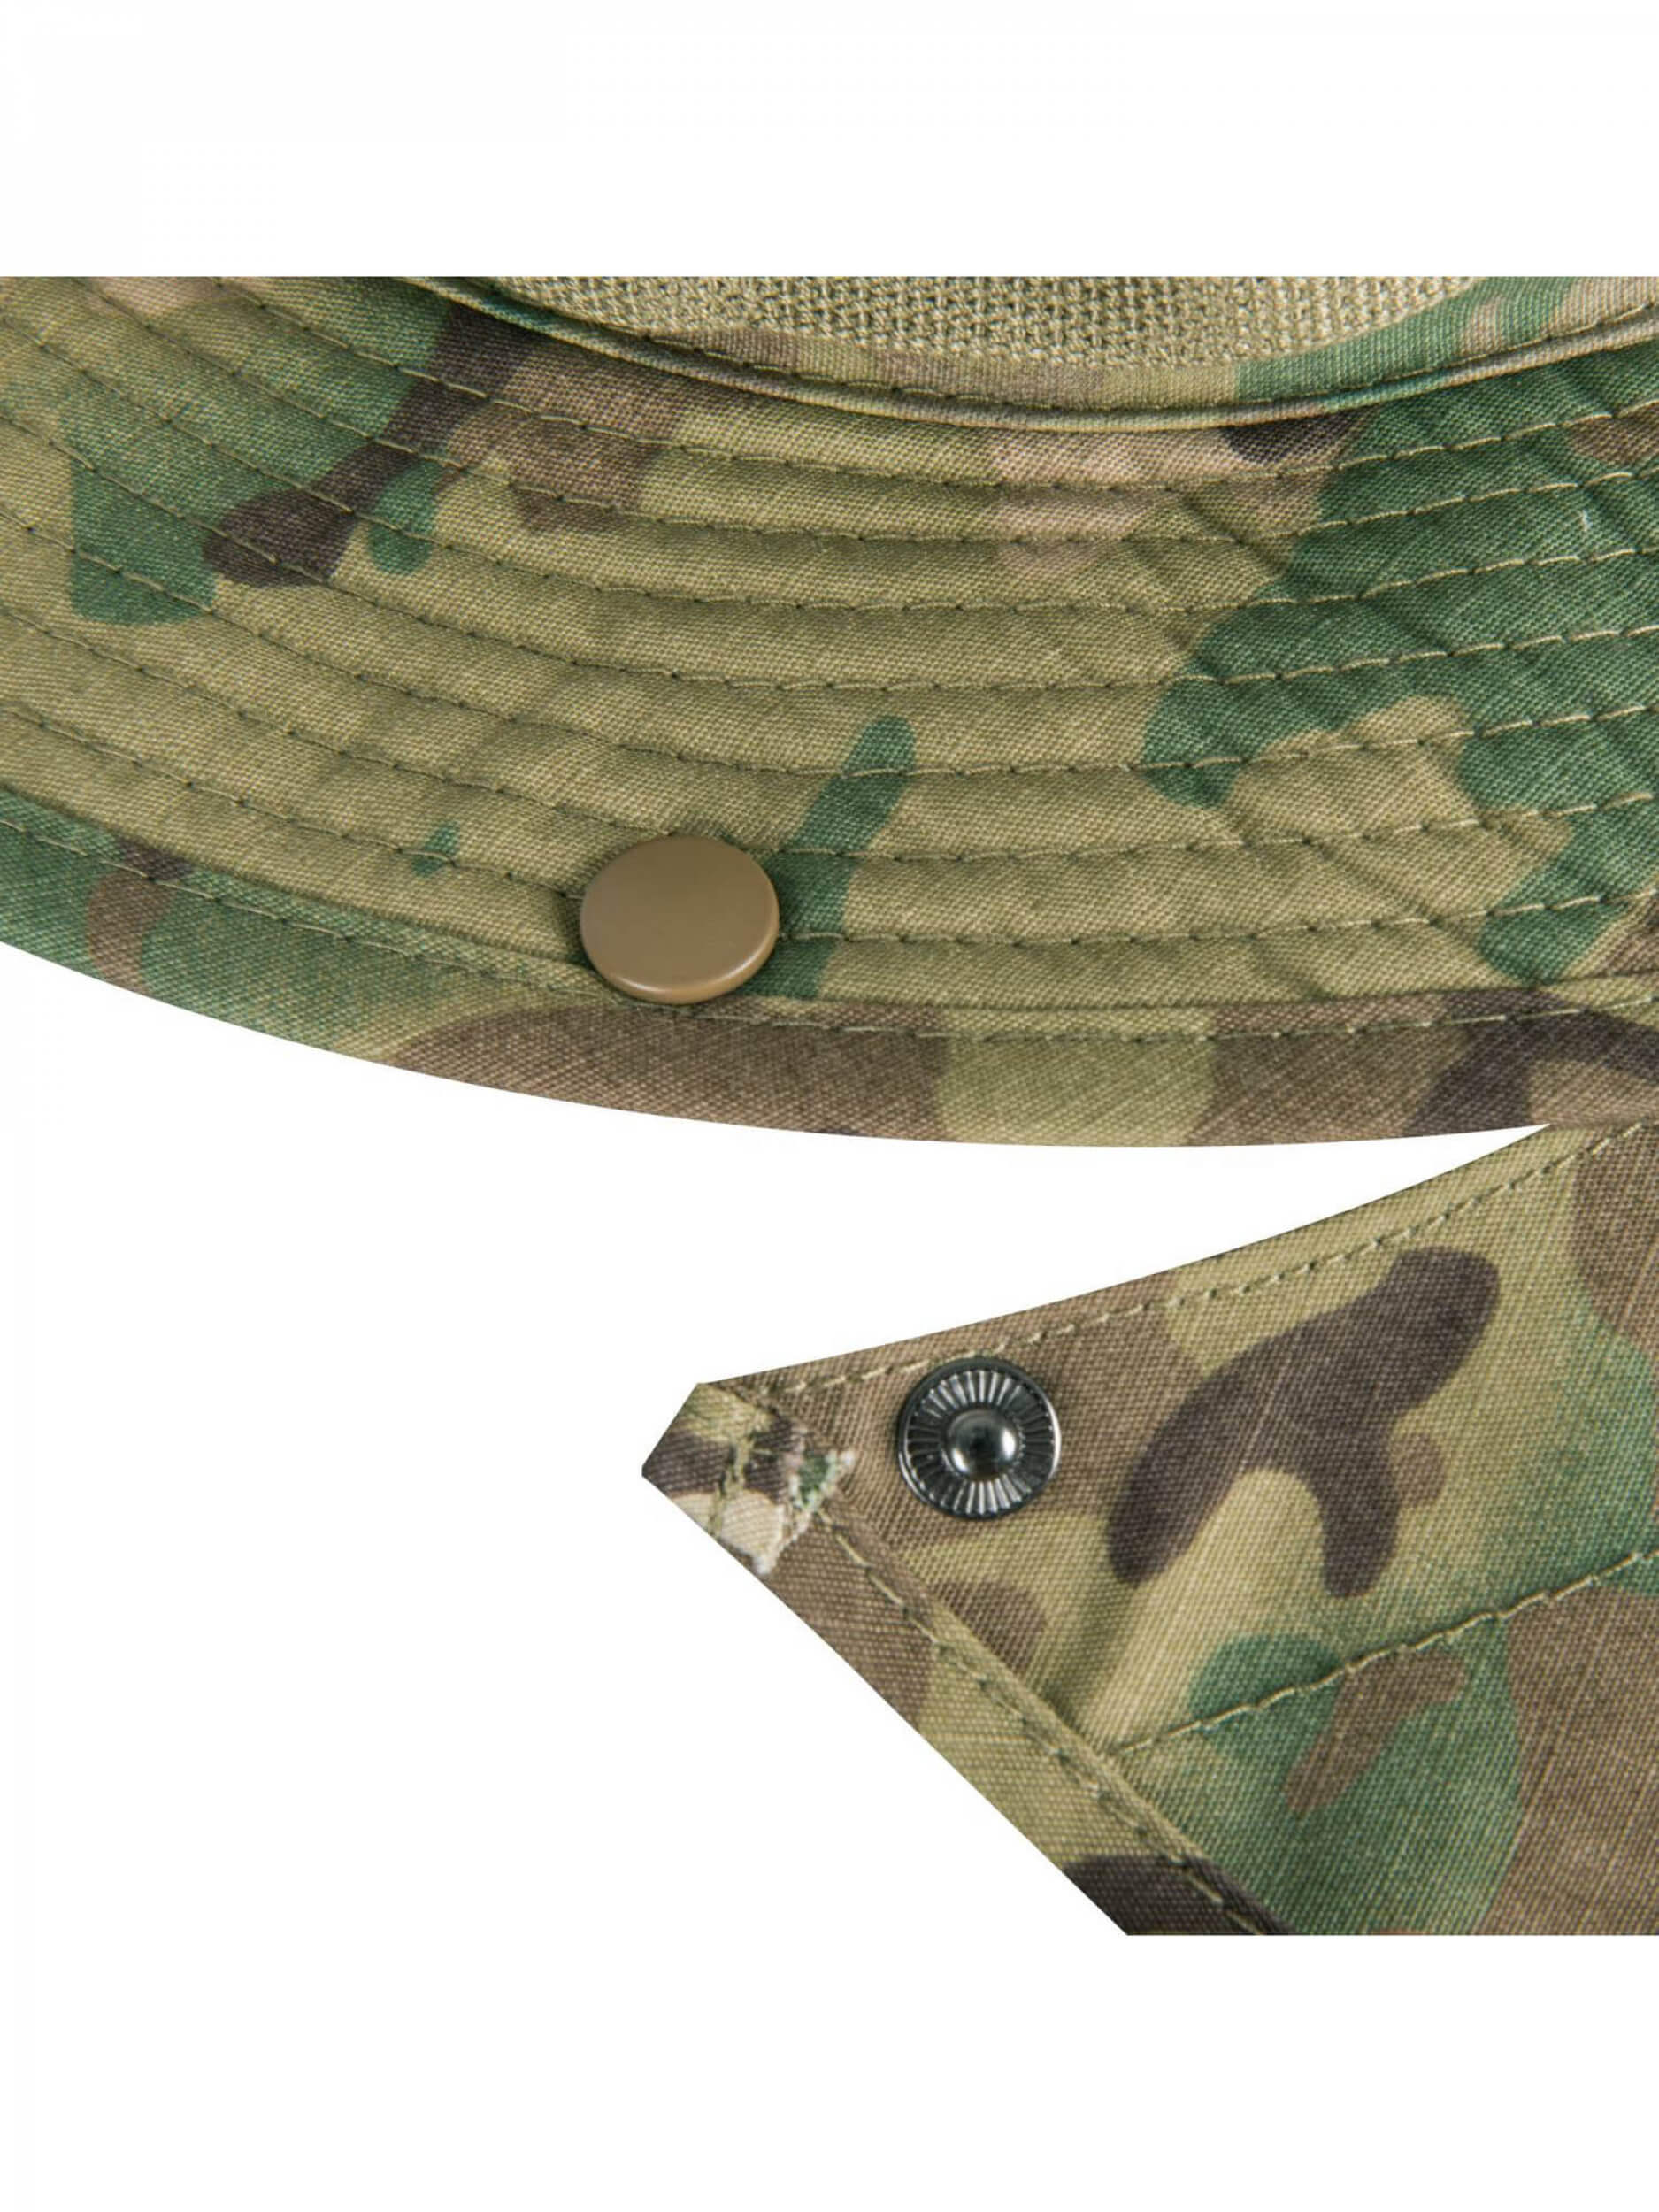 Helikon-Tex Boonie Hat -PolyCotton Ripstop- PL Woodland